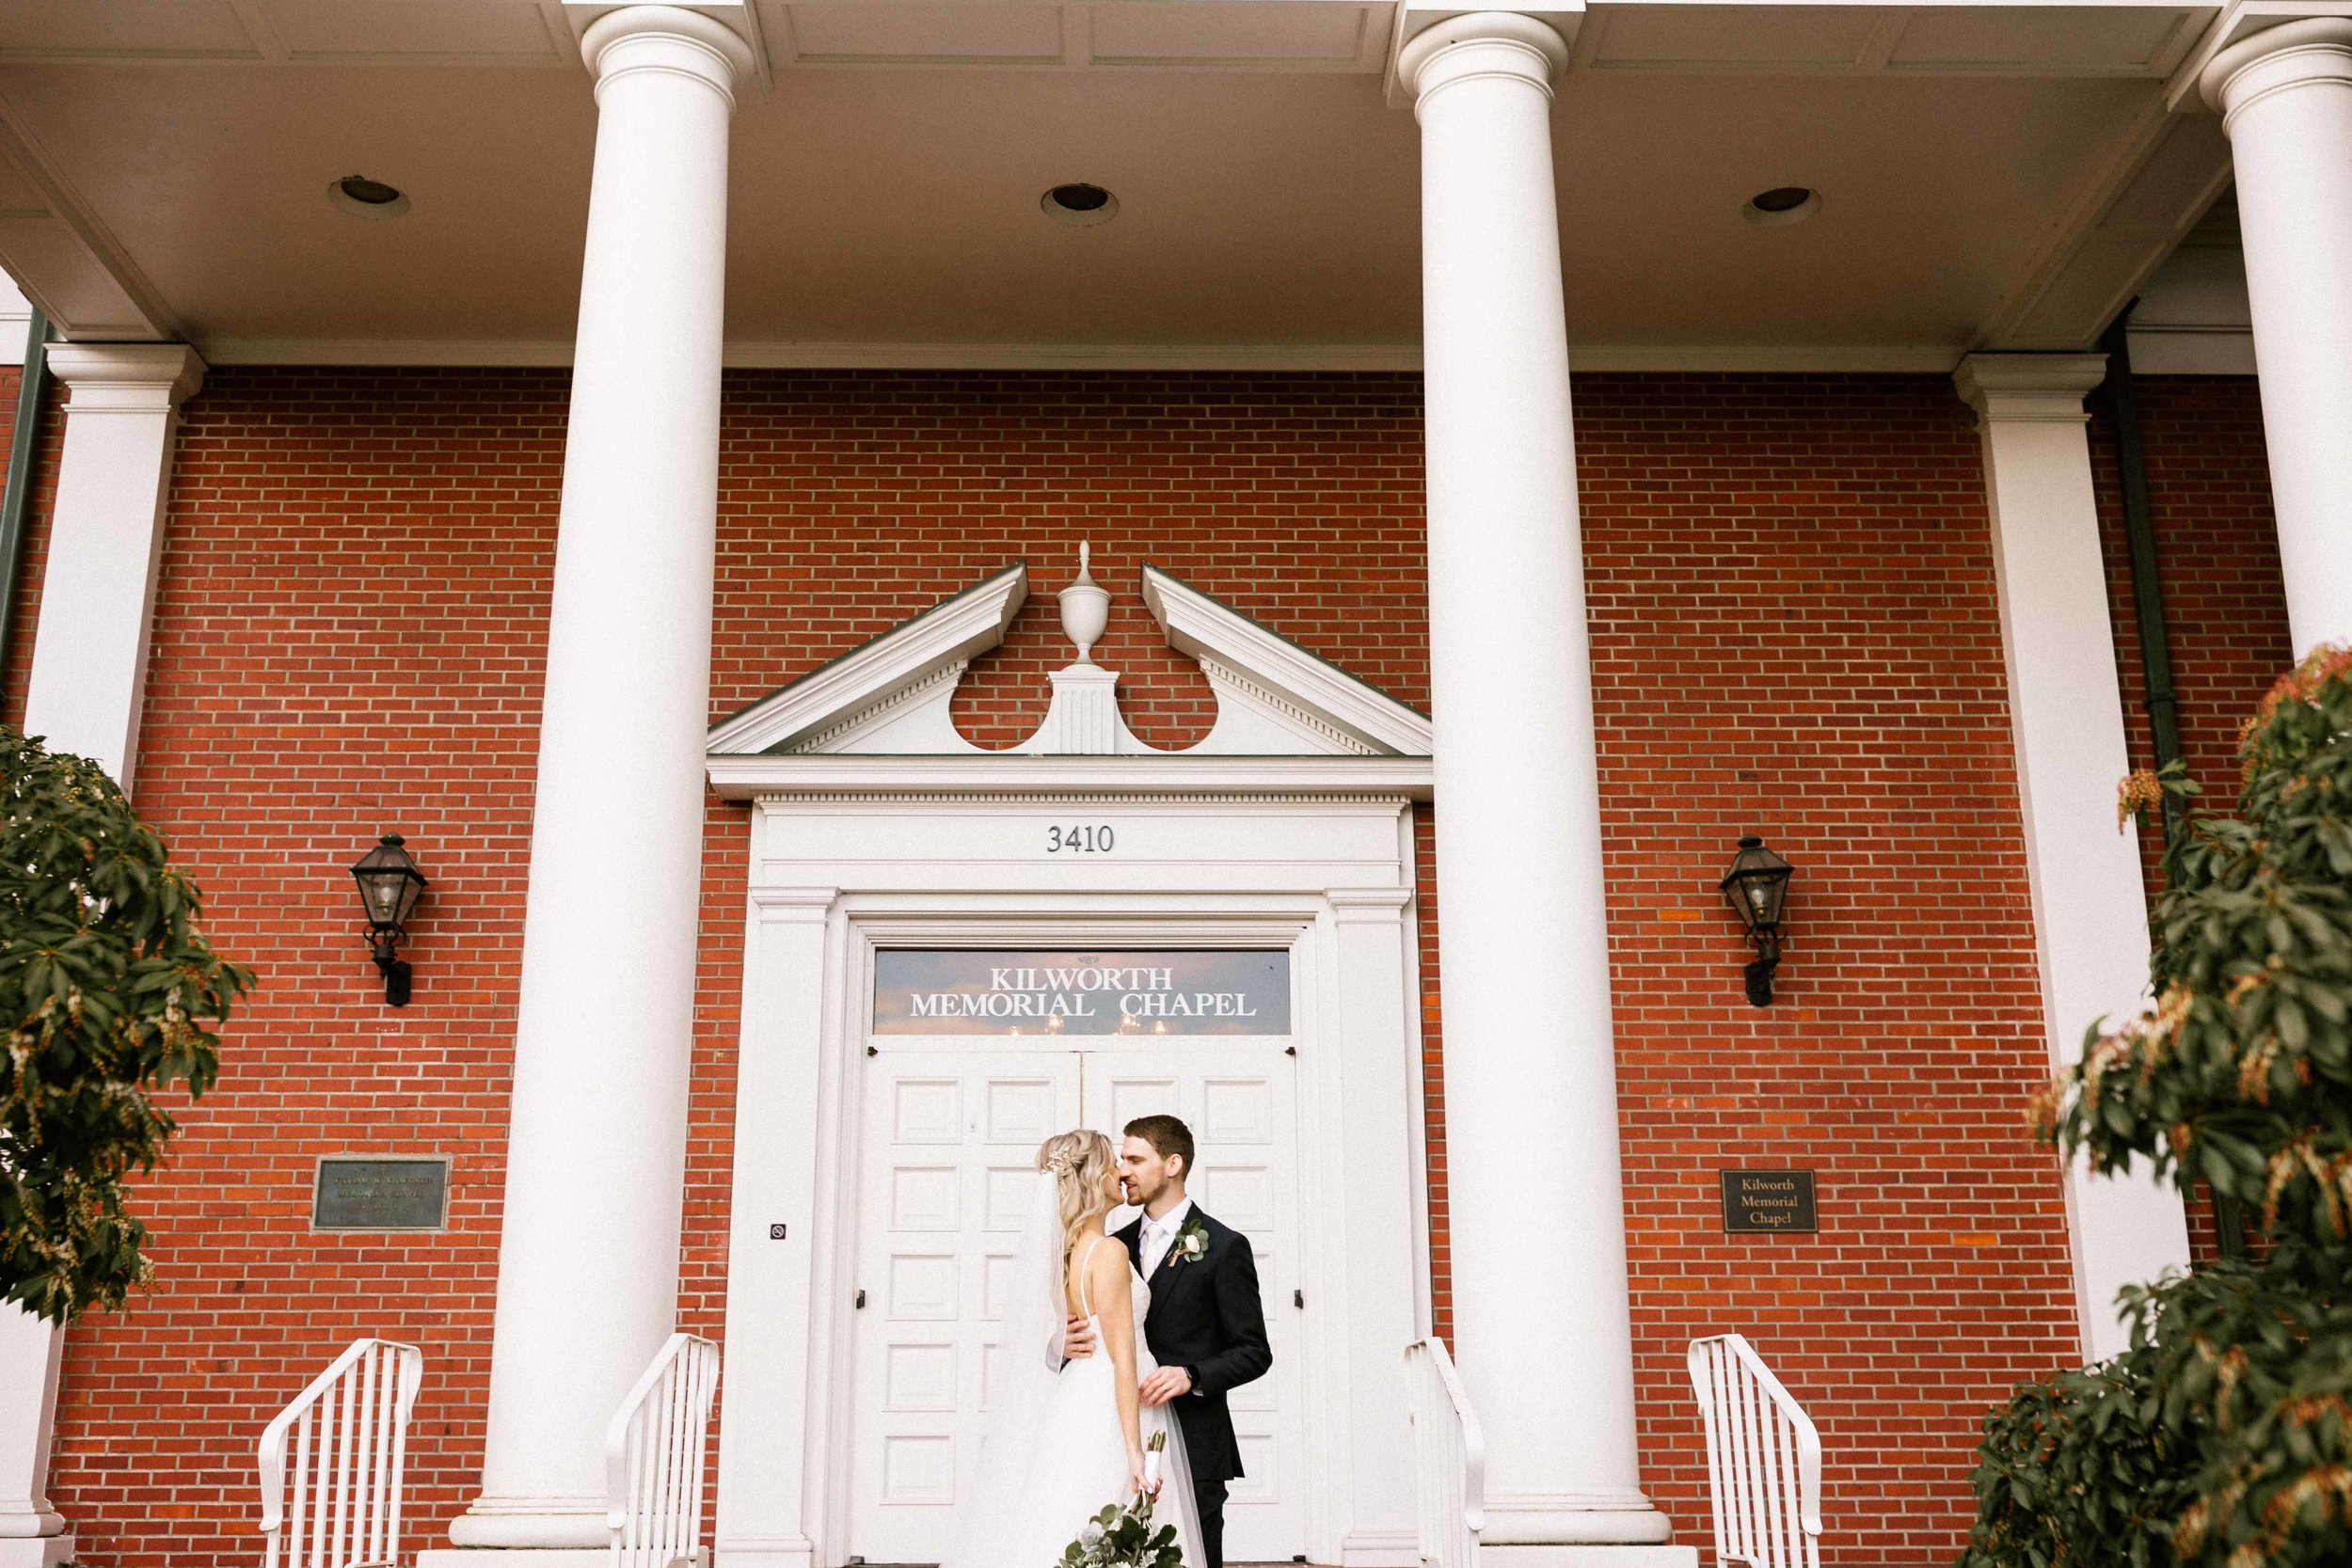 kilworth-memorial-chapel-wedding-90.jpg